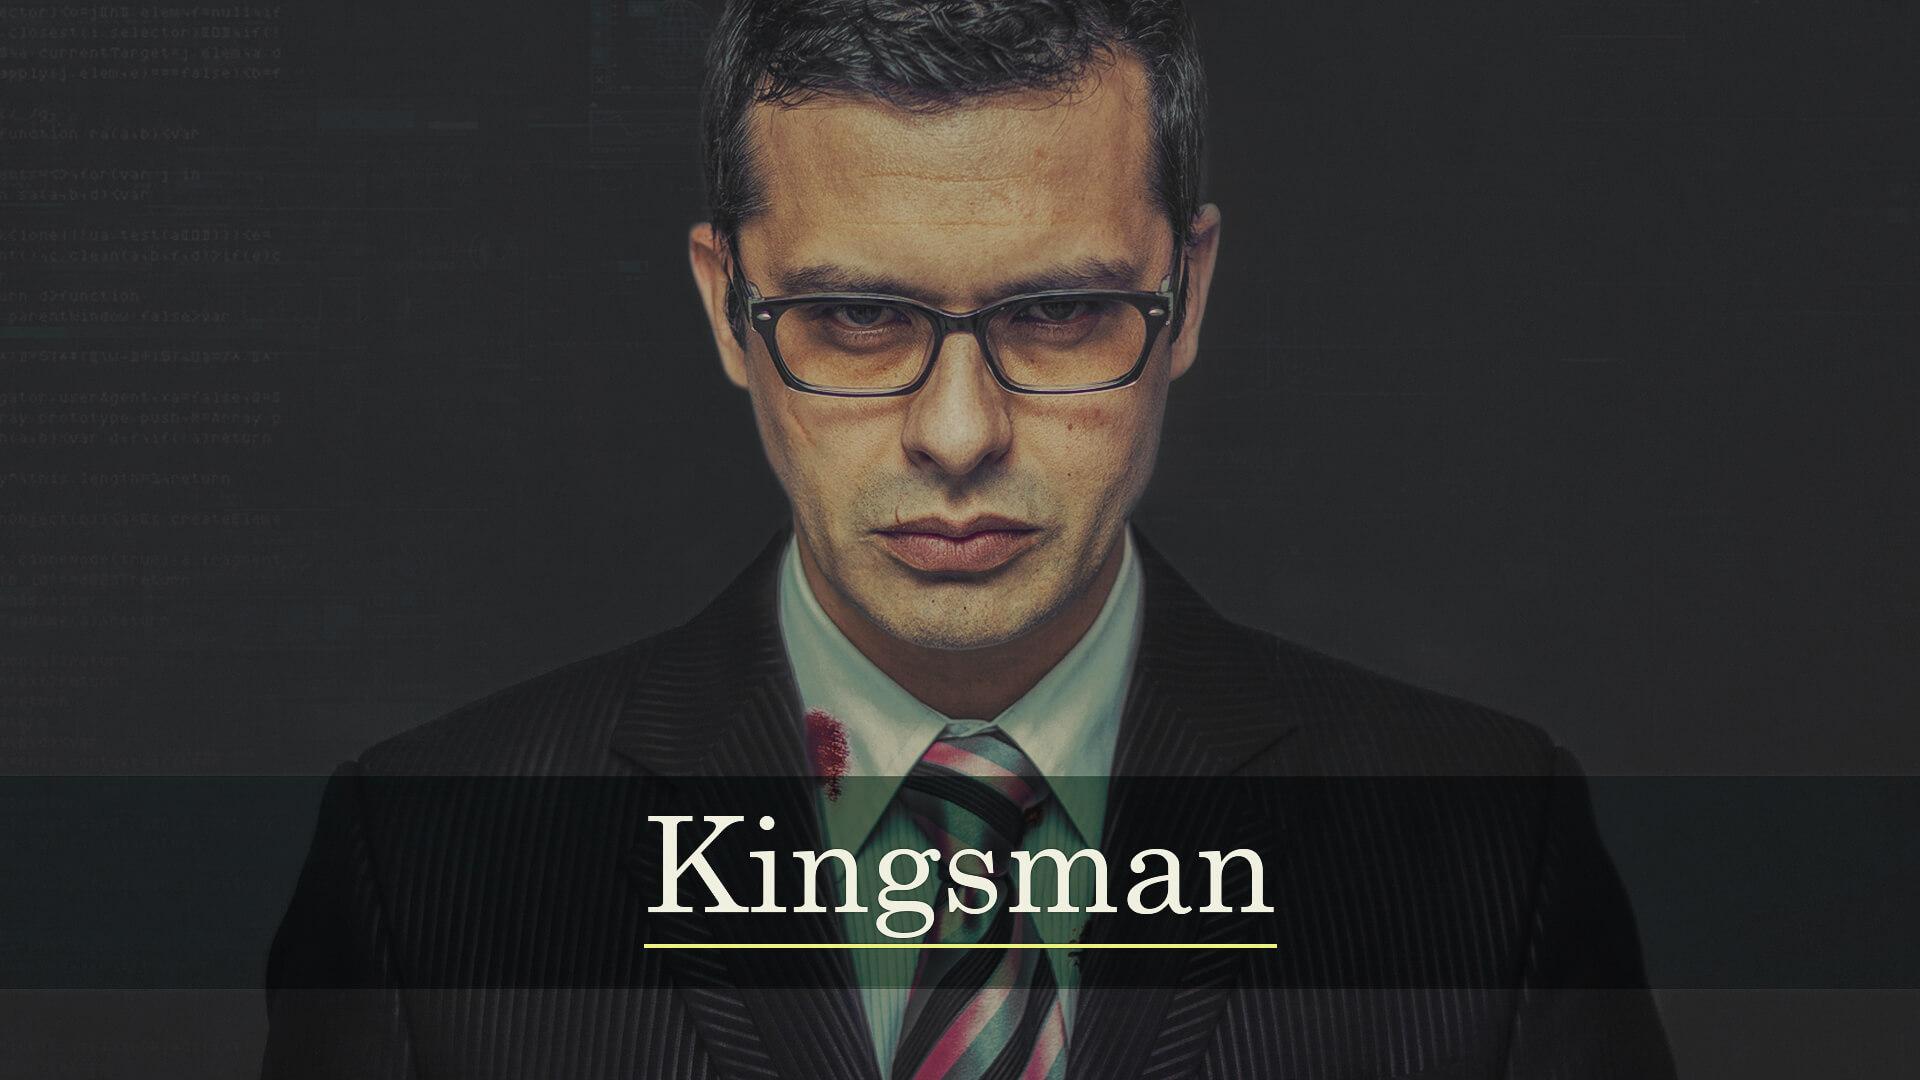 kingsman_thump